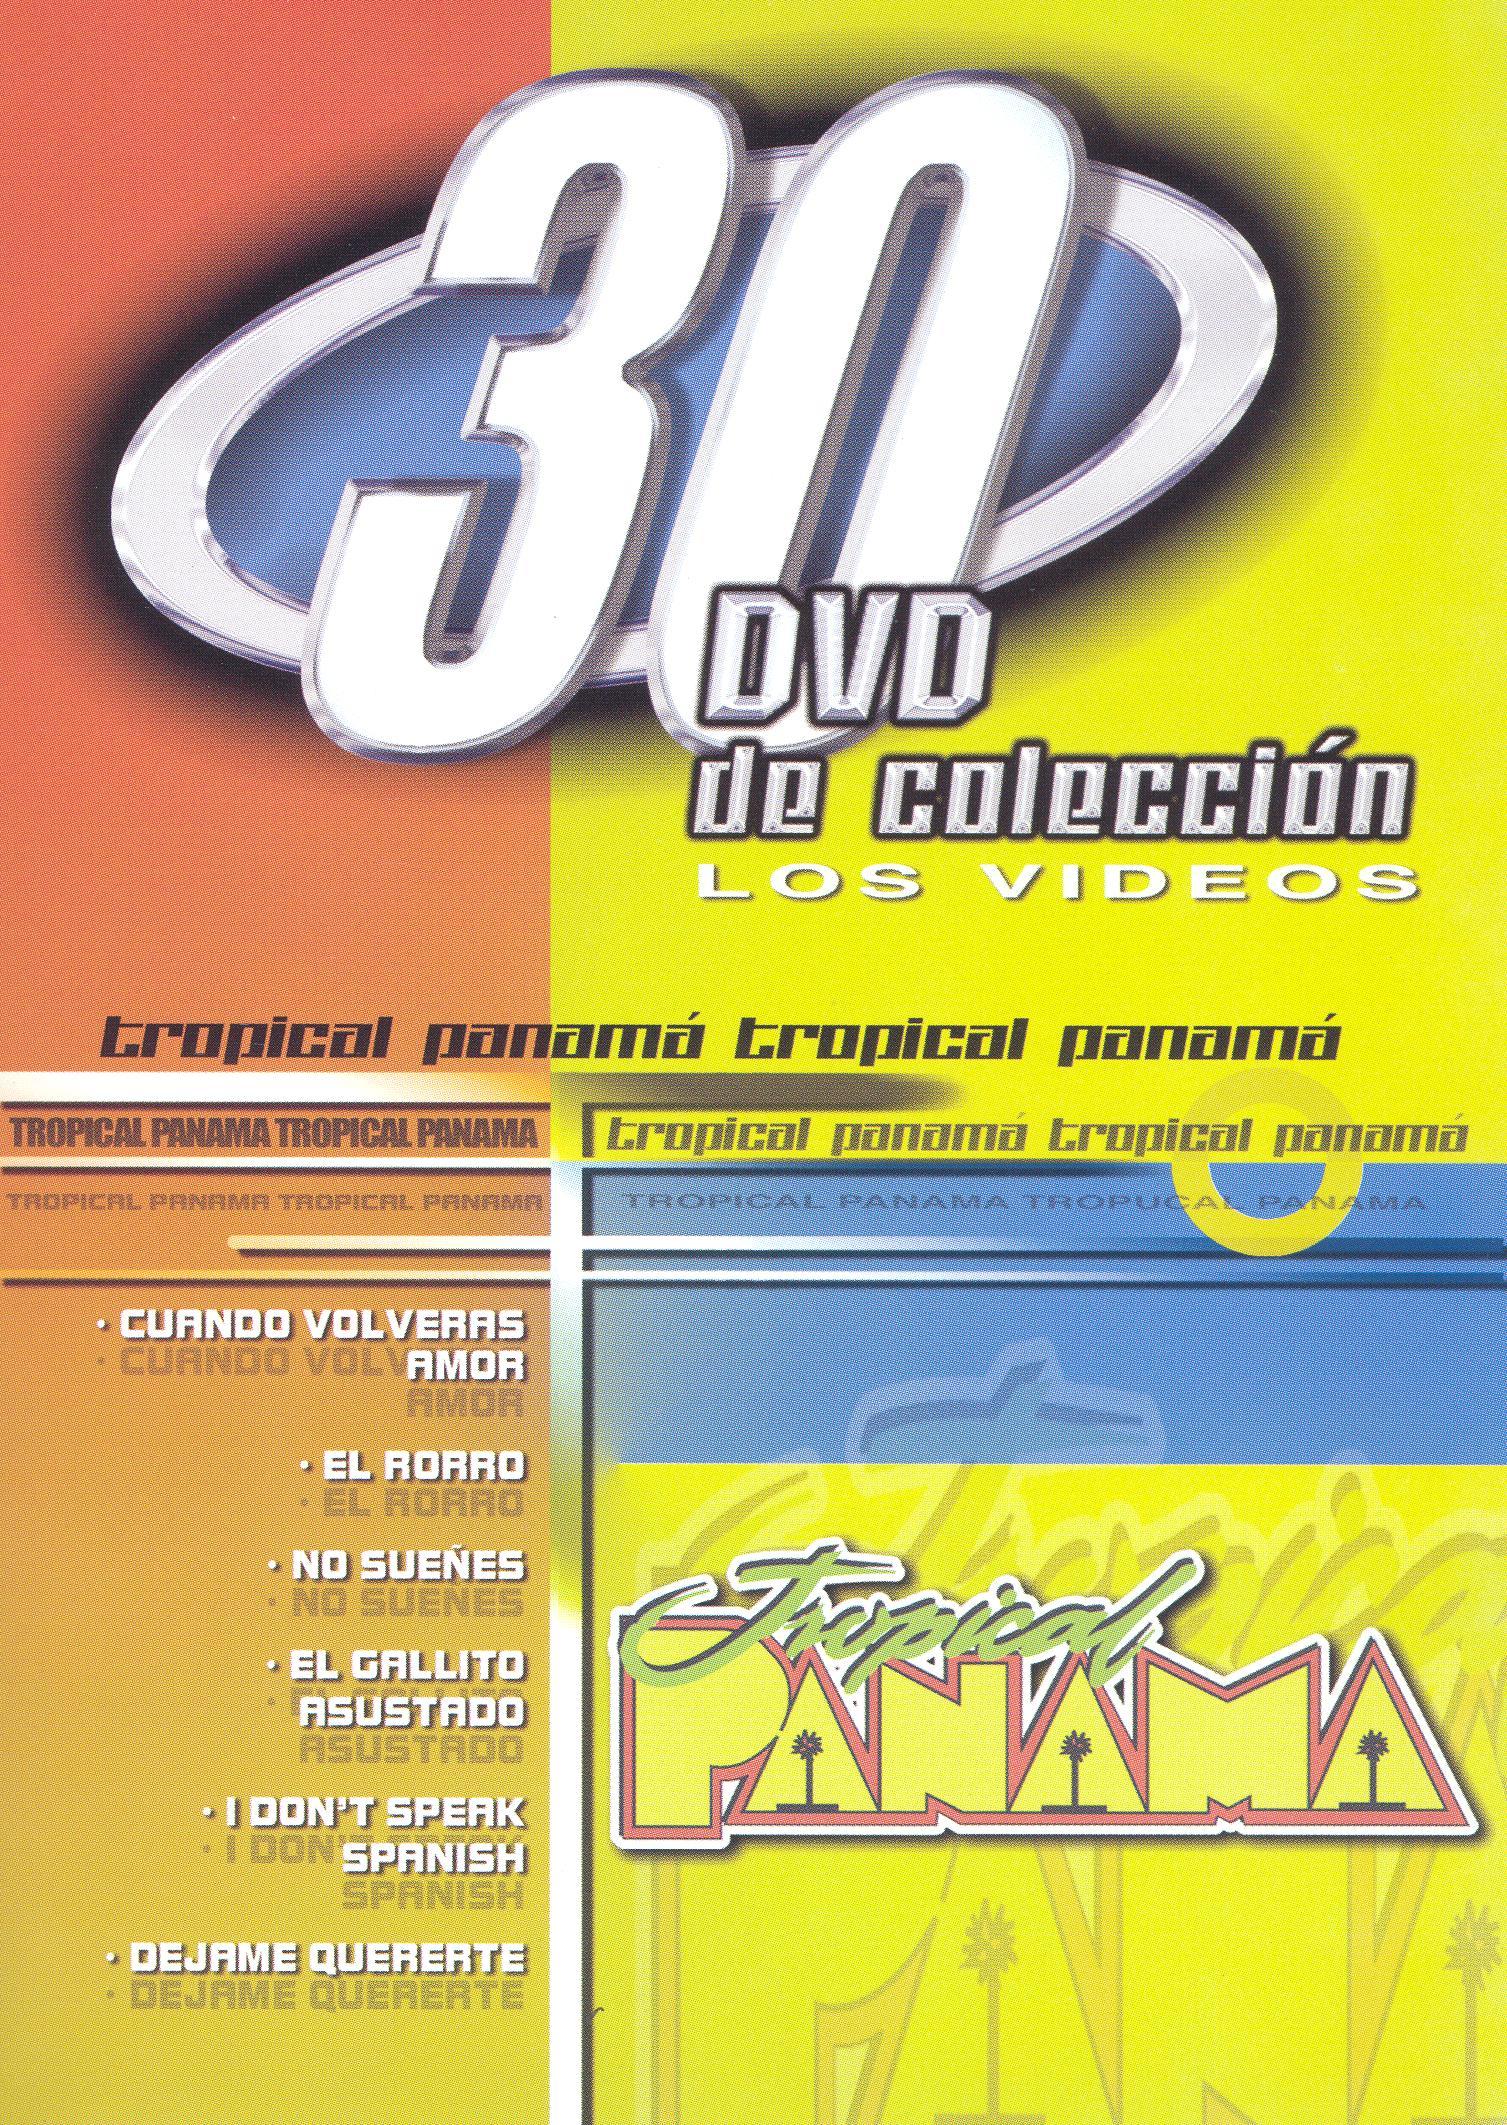 Tropical Panama: 30 DVD de Coleccion